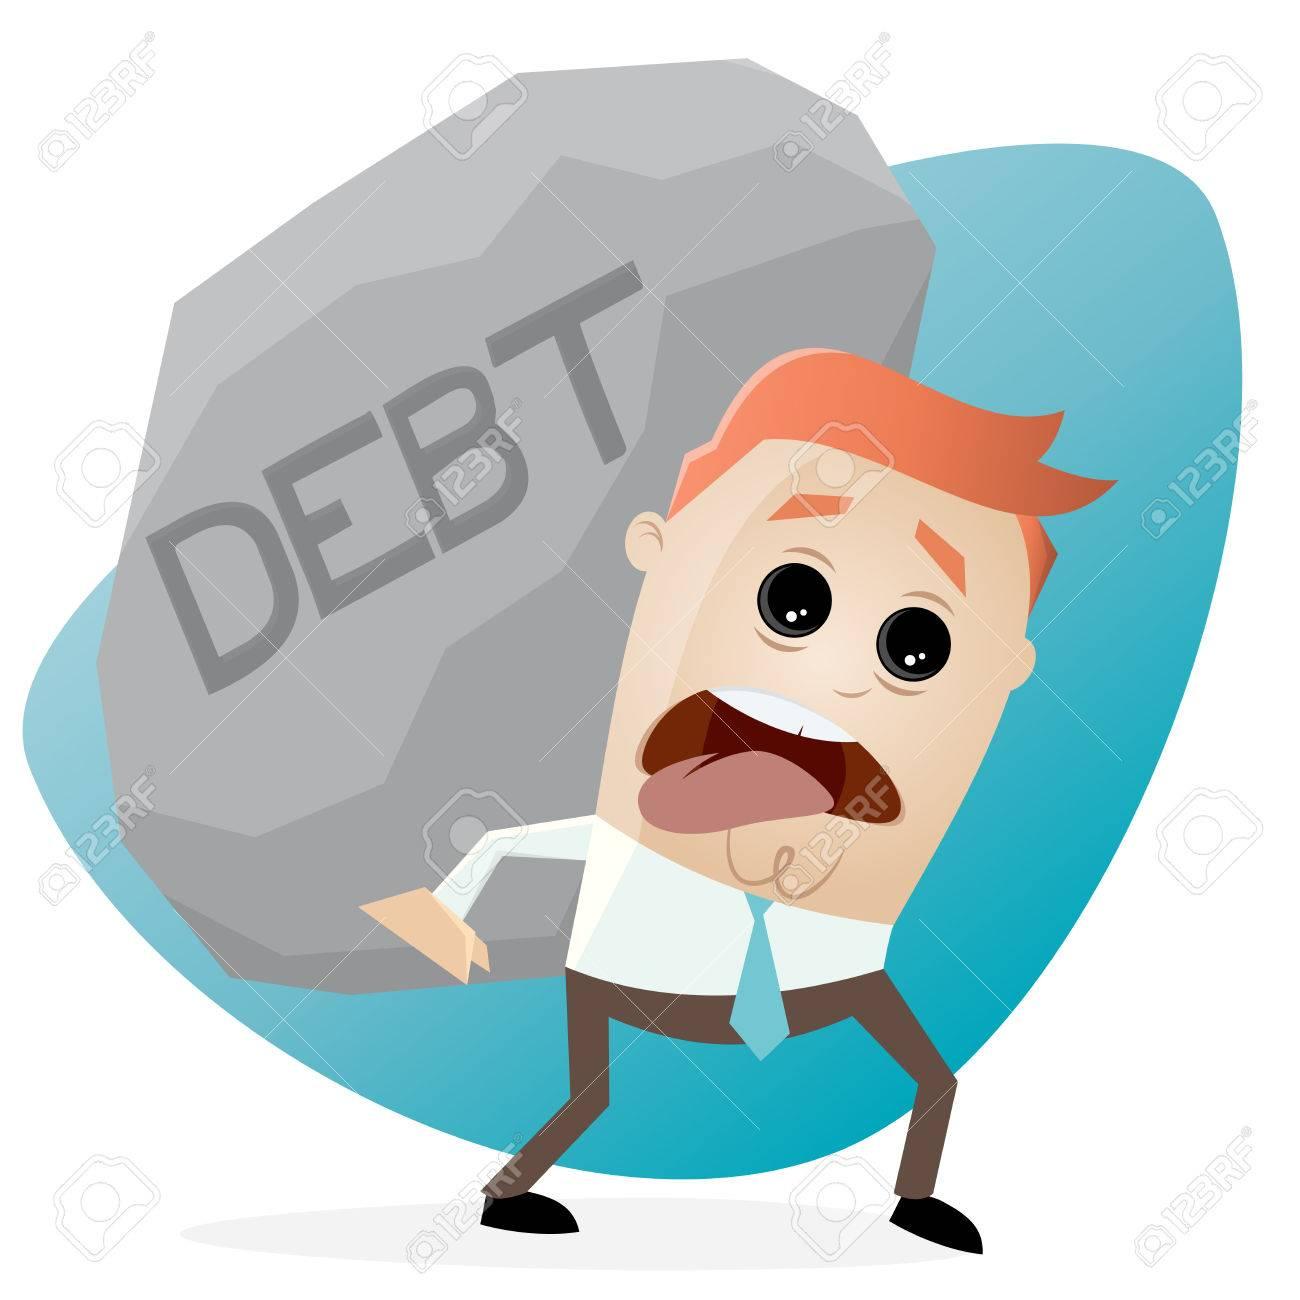 clipart of businessman carrying a big debt rock.